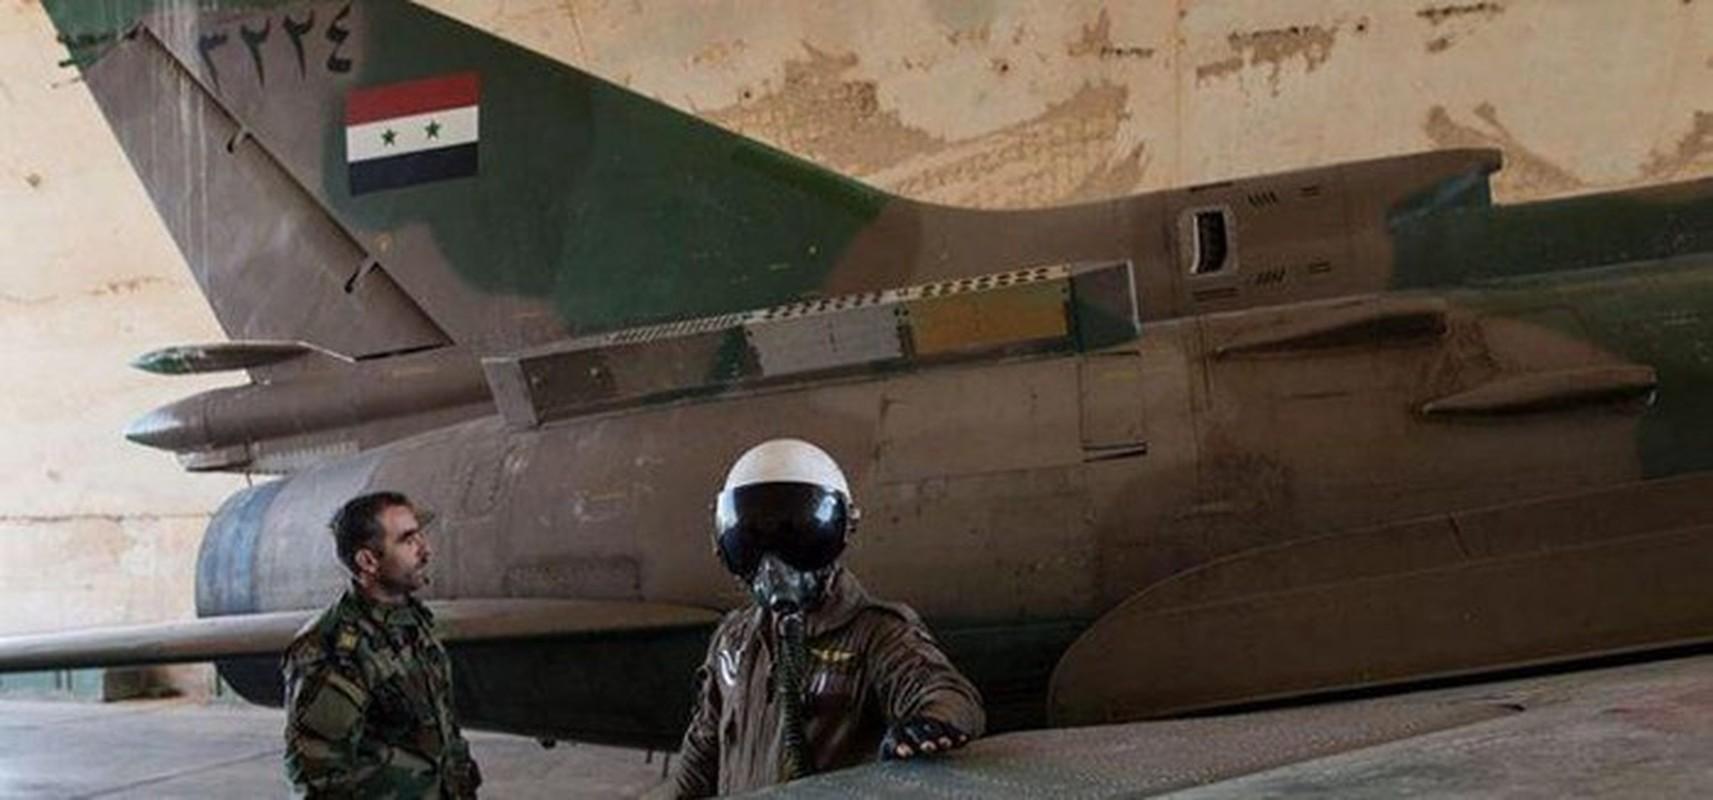 Toan canh vu Su-22 Syria bi phong khong Israel ban ha moi nhat-Hinh-13